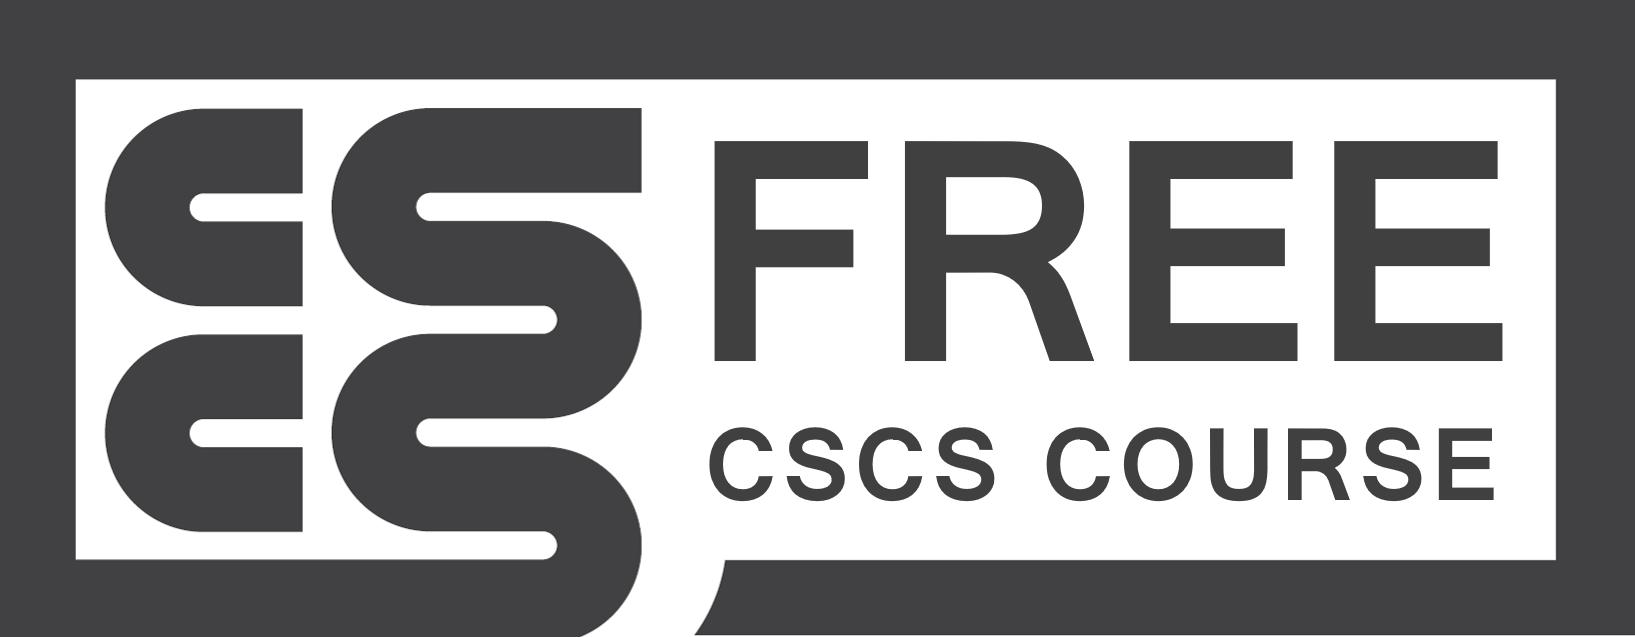 FREE CSCS COURSE